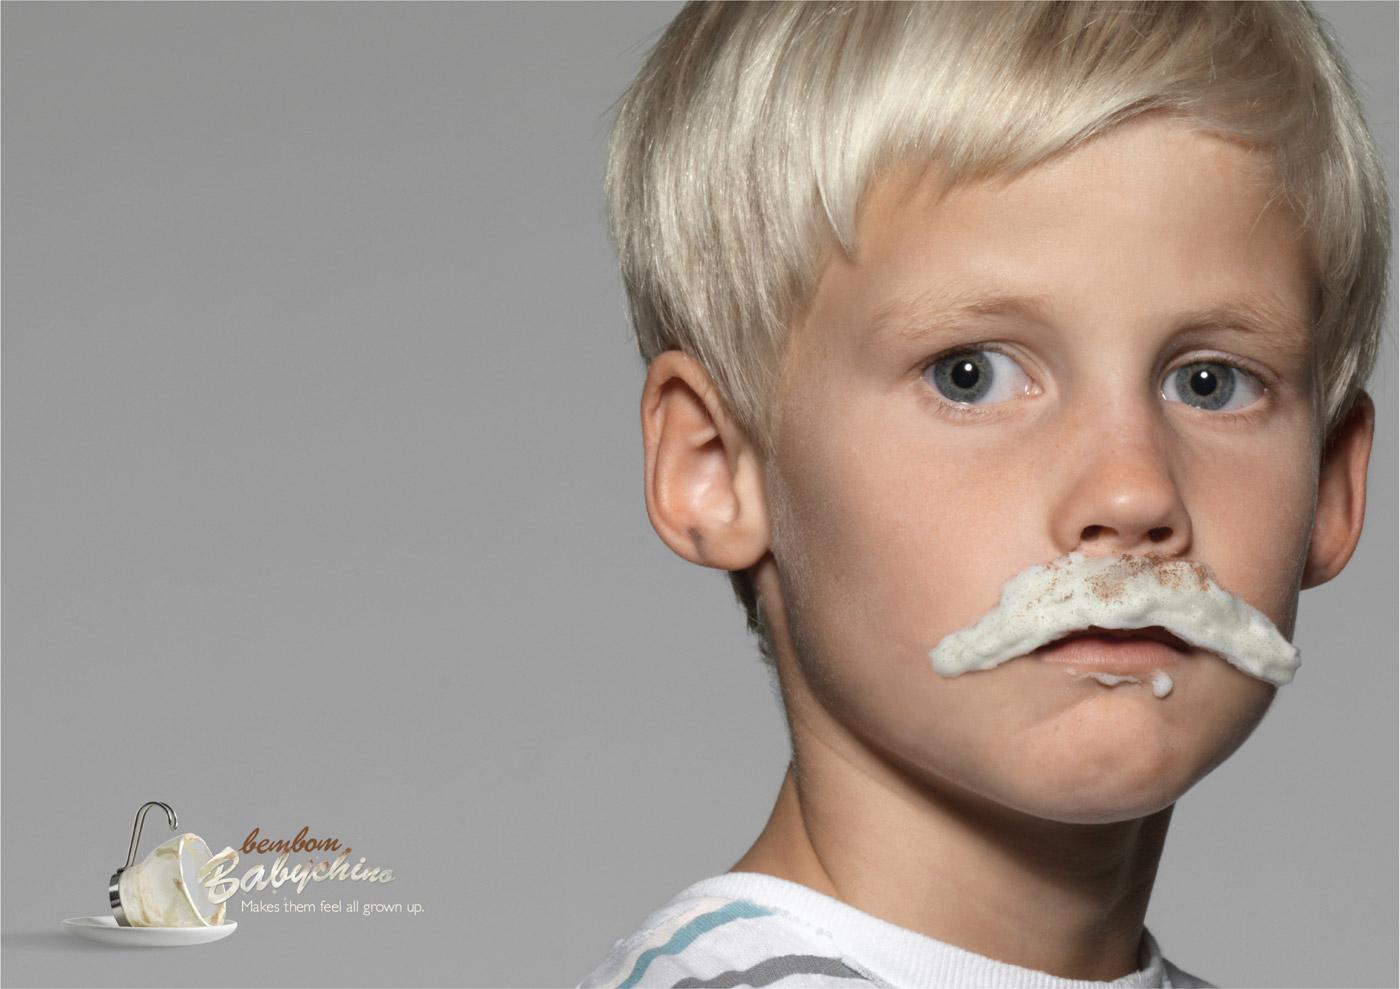 Publicidad infantil